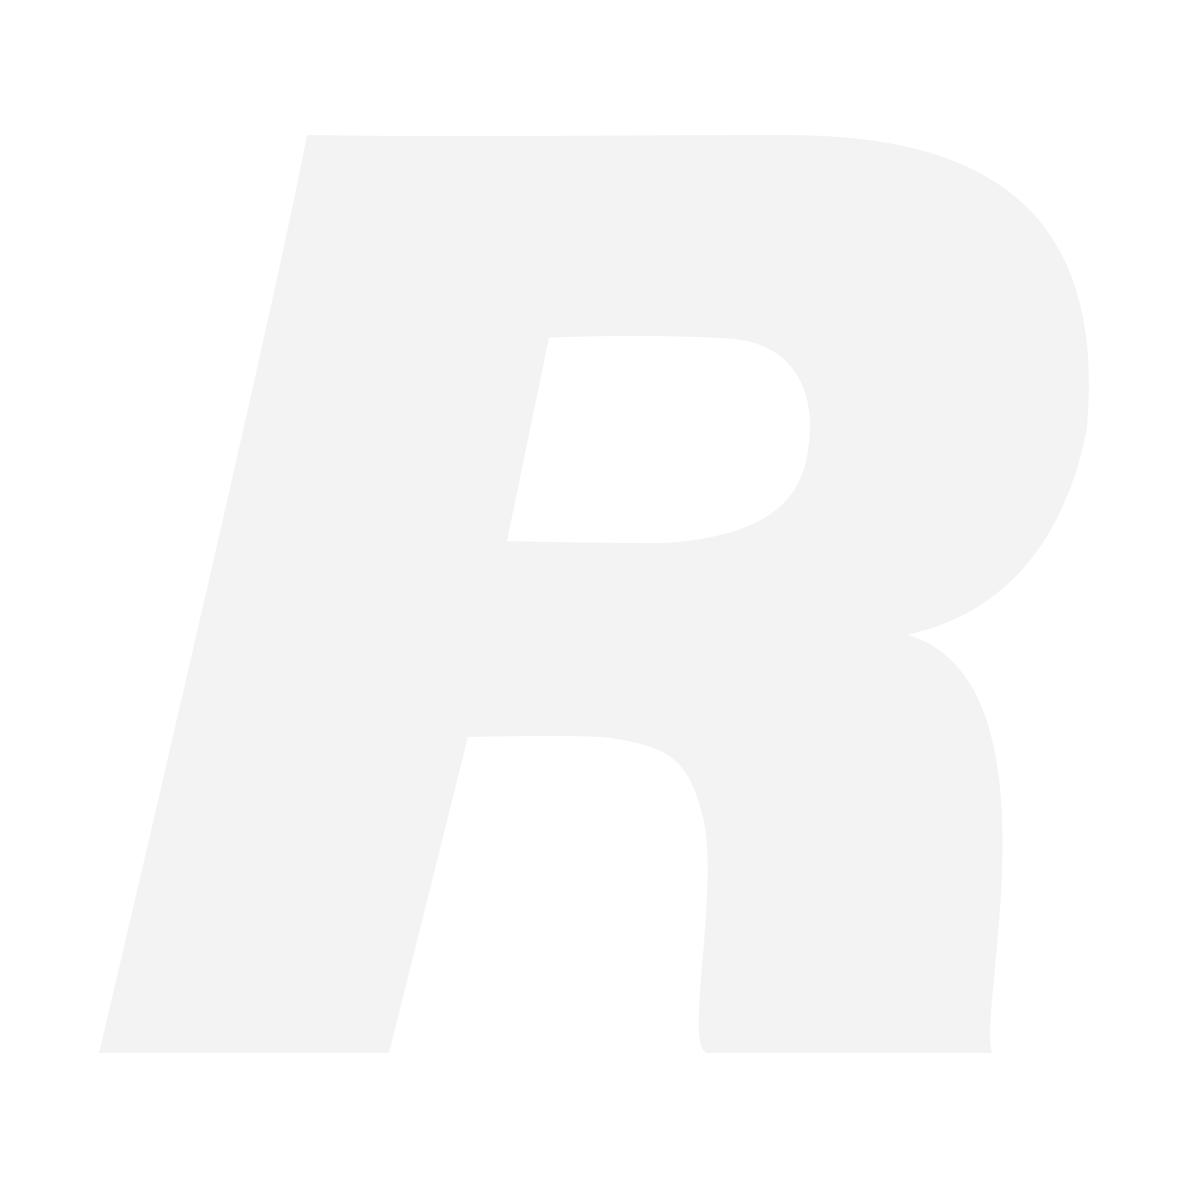 SONY DSC-RX0 KÄYTETTY SIS.ALV. 24%